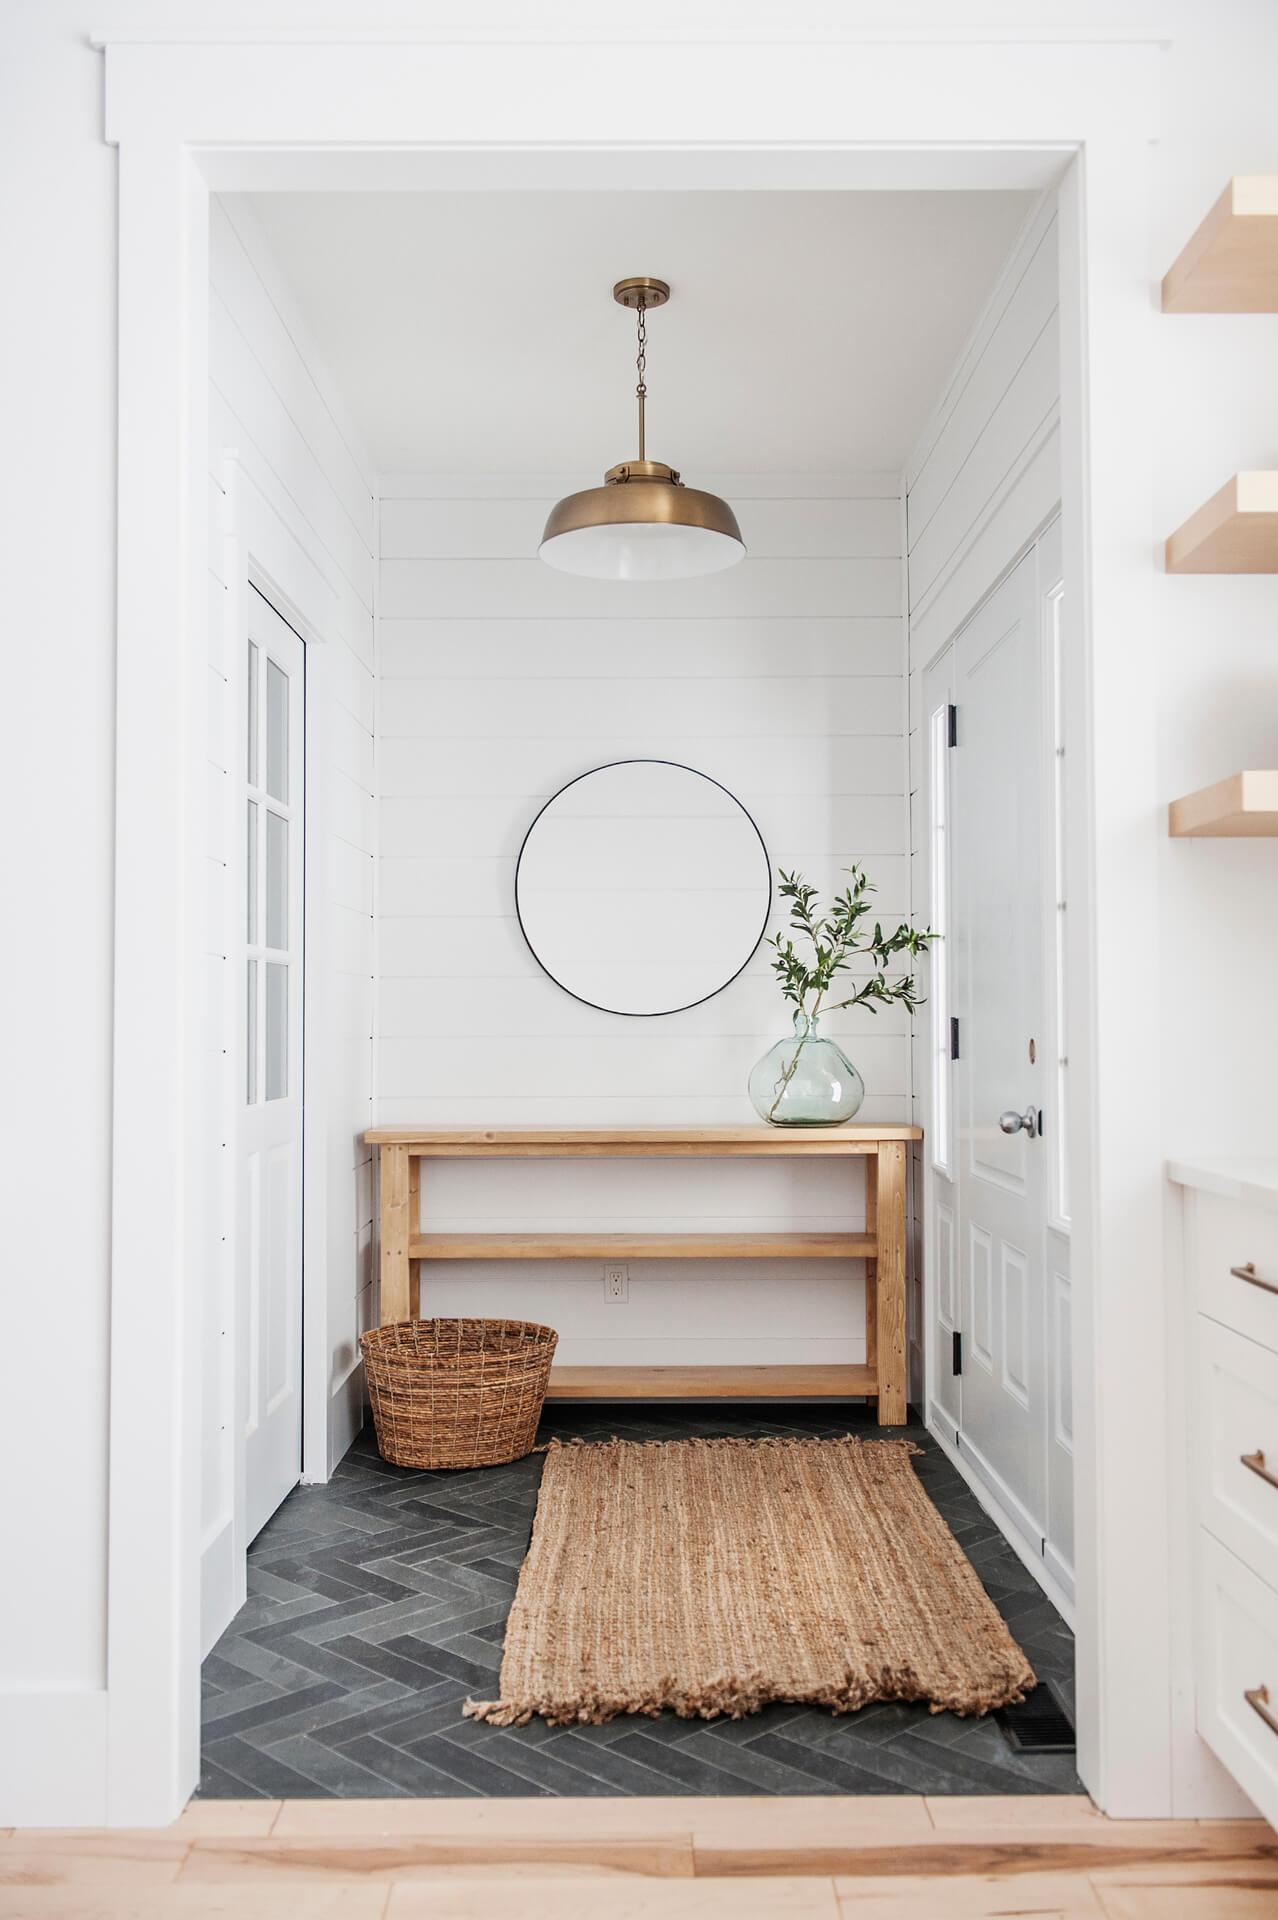 AKB Design cuisine blanche armoire noire poignee laiton comptoir quartz garde manger 12